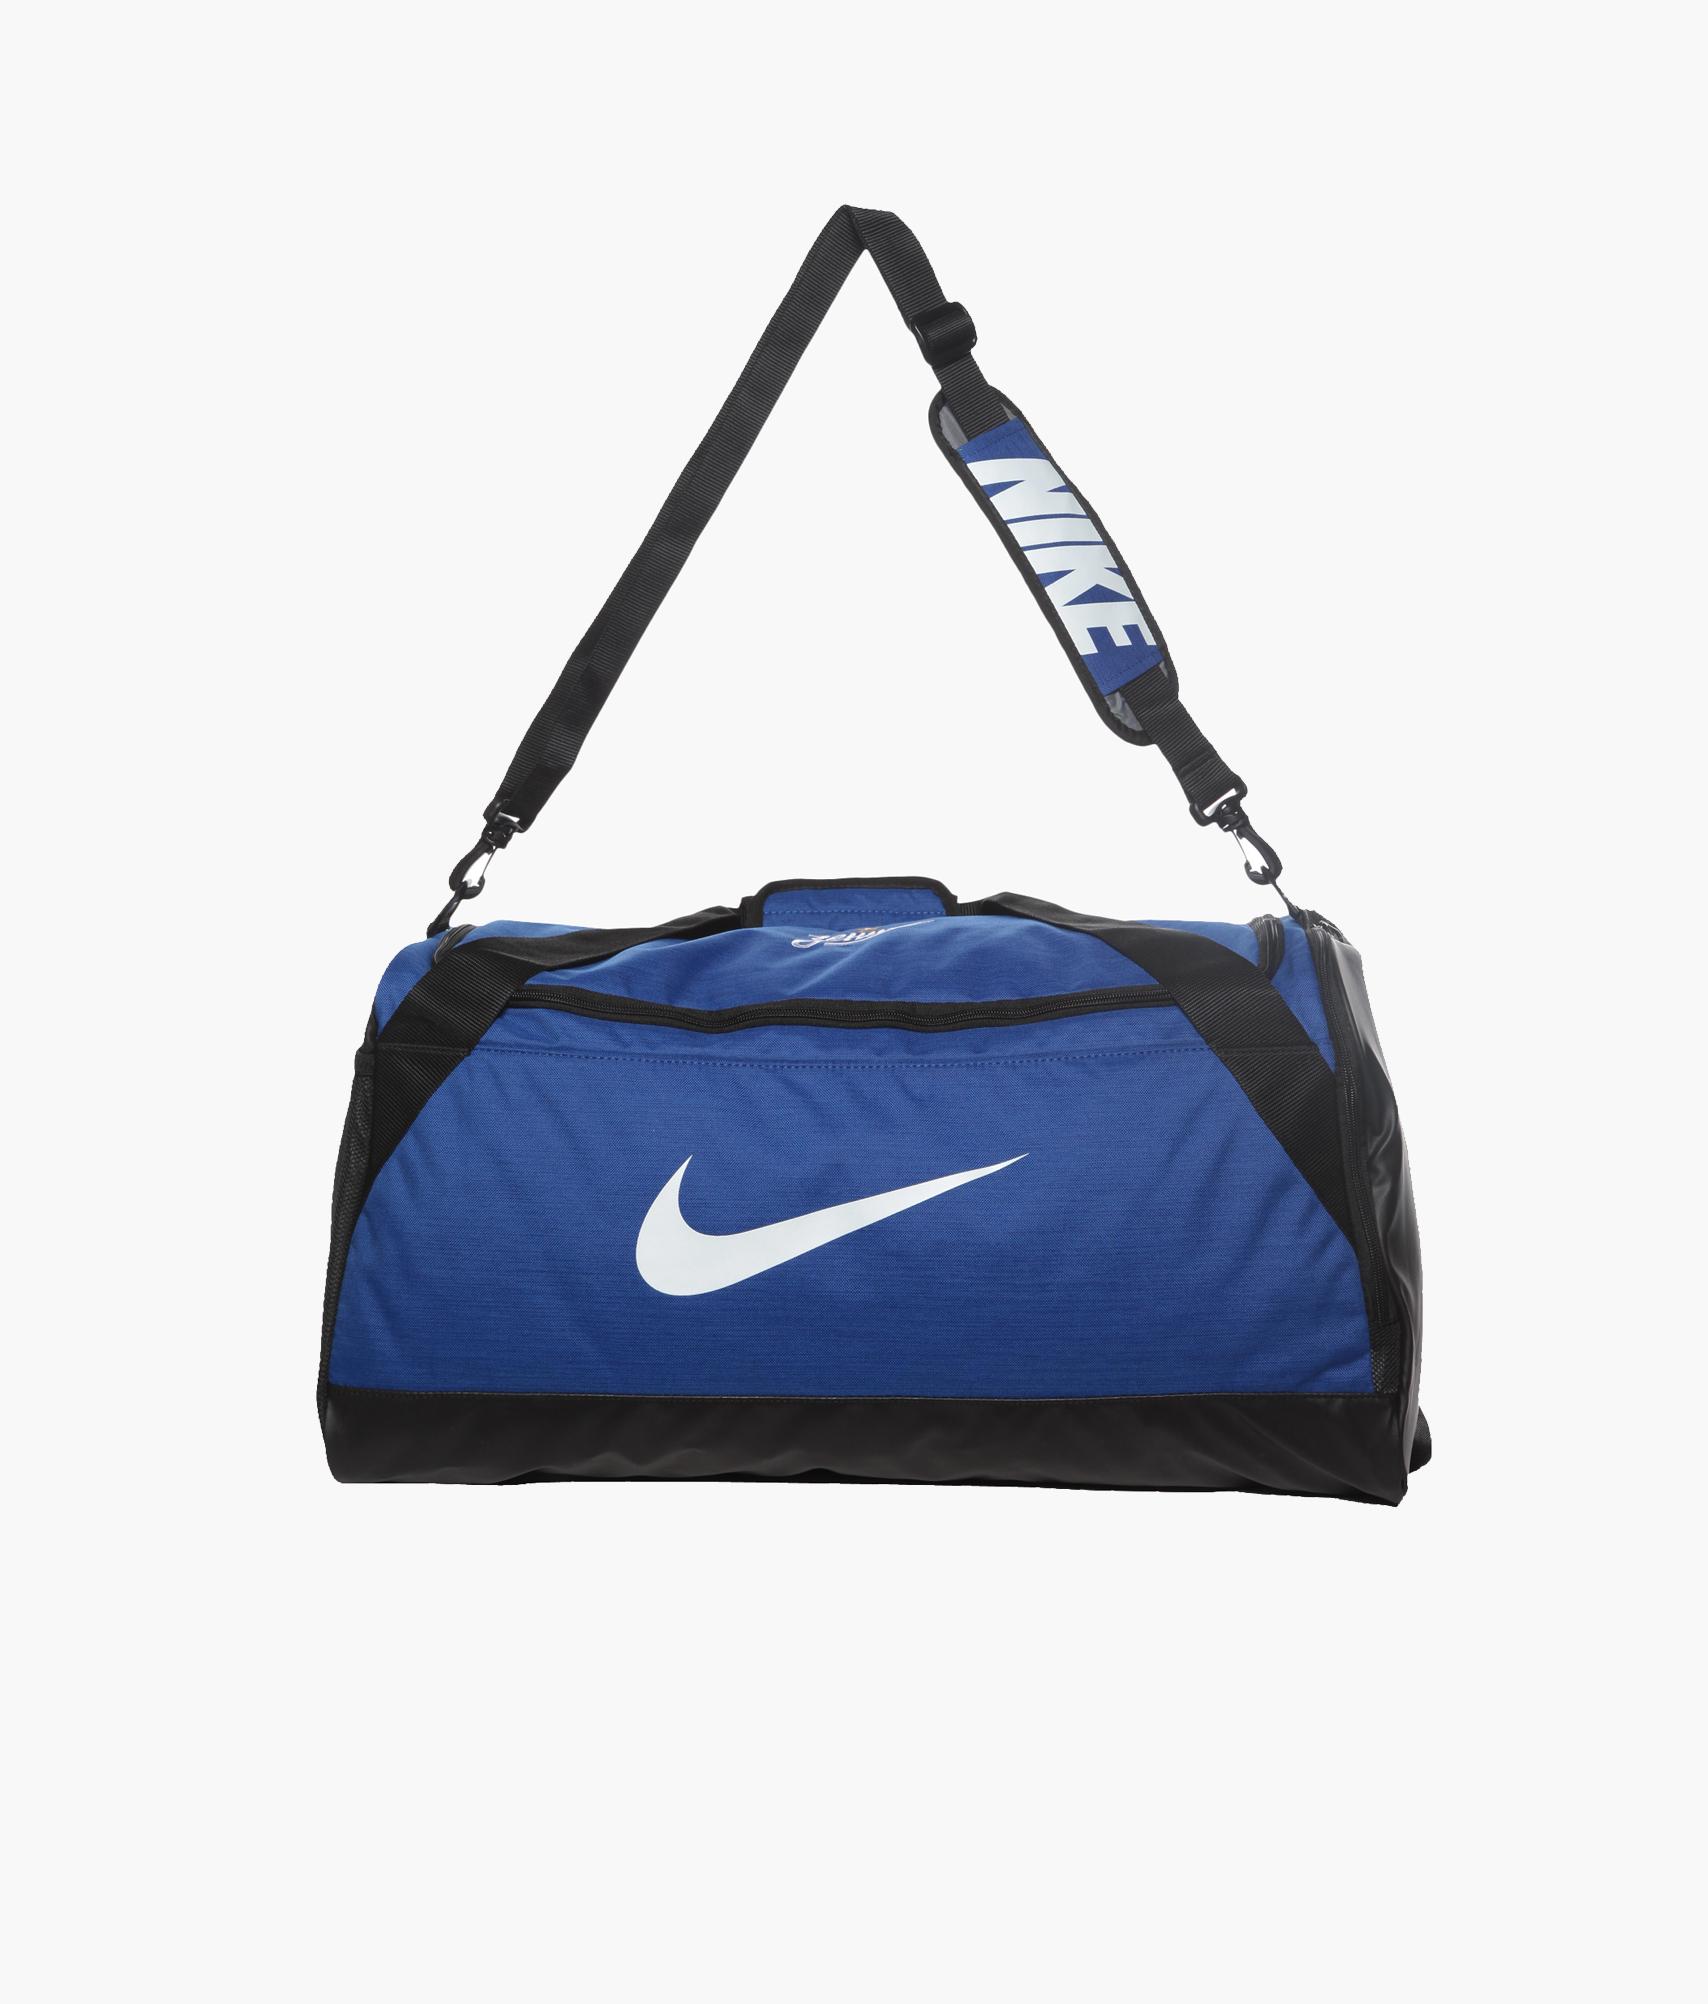 Сумка Nike Nike Цвет-Синий nike сумка nike core small items 3 0